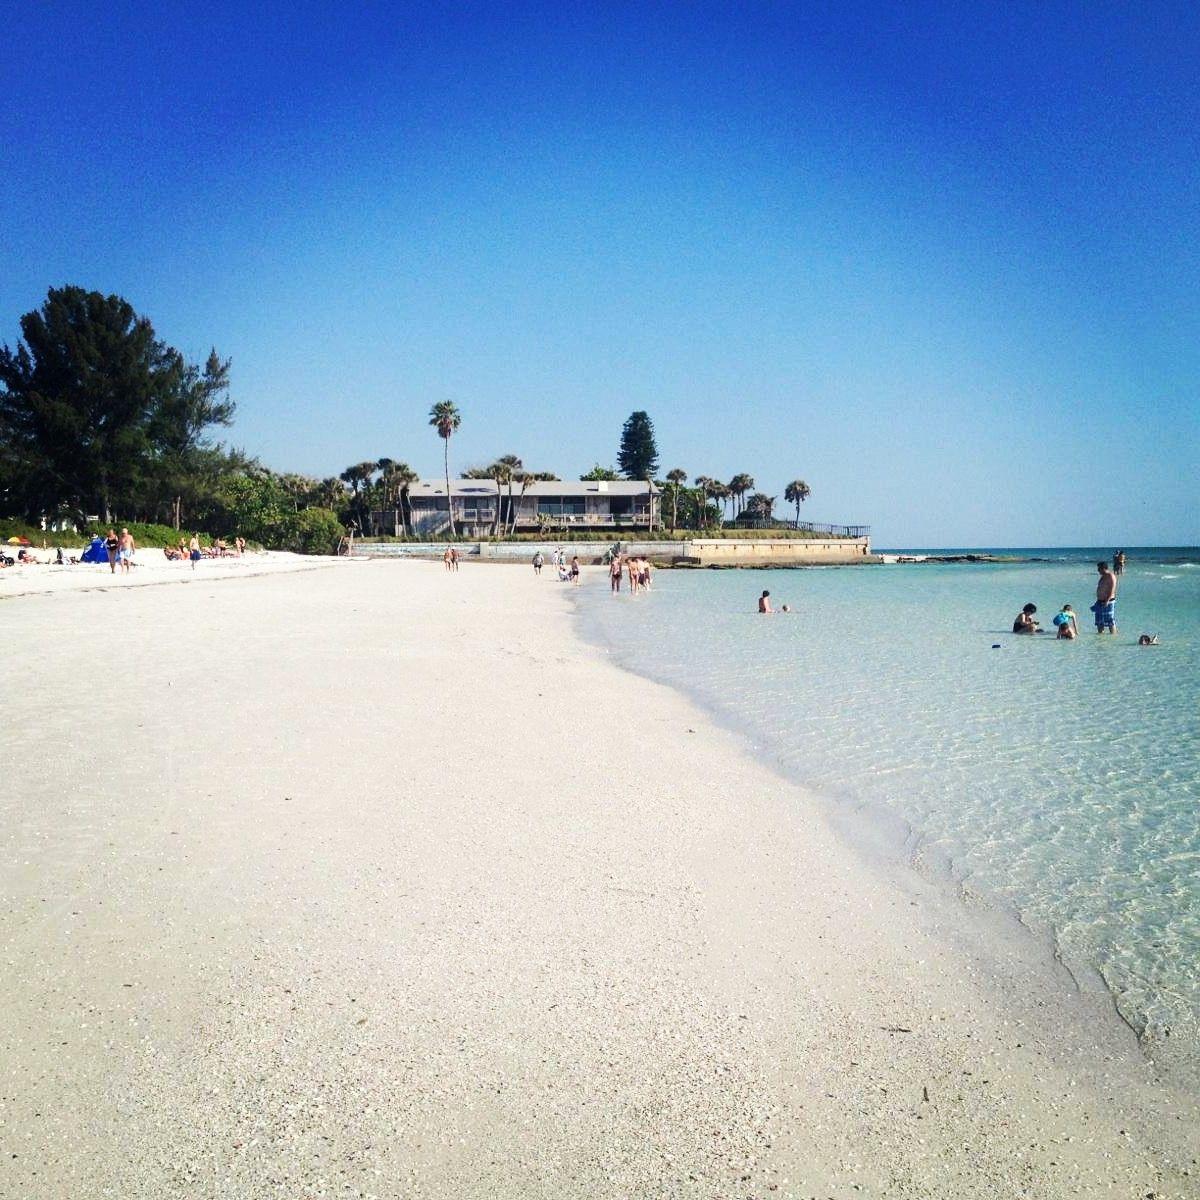 Crescent Beach On Siesta Key Fl Beach Resorts Siesta Key Florida Tropical Beach Resorts